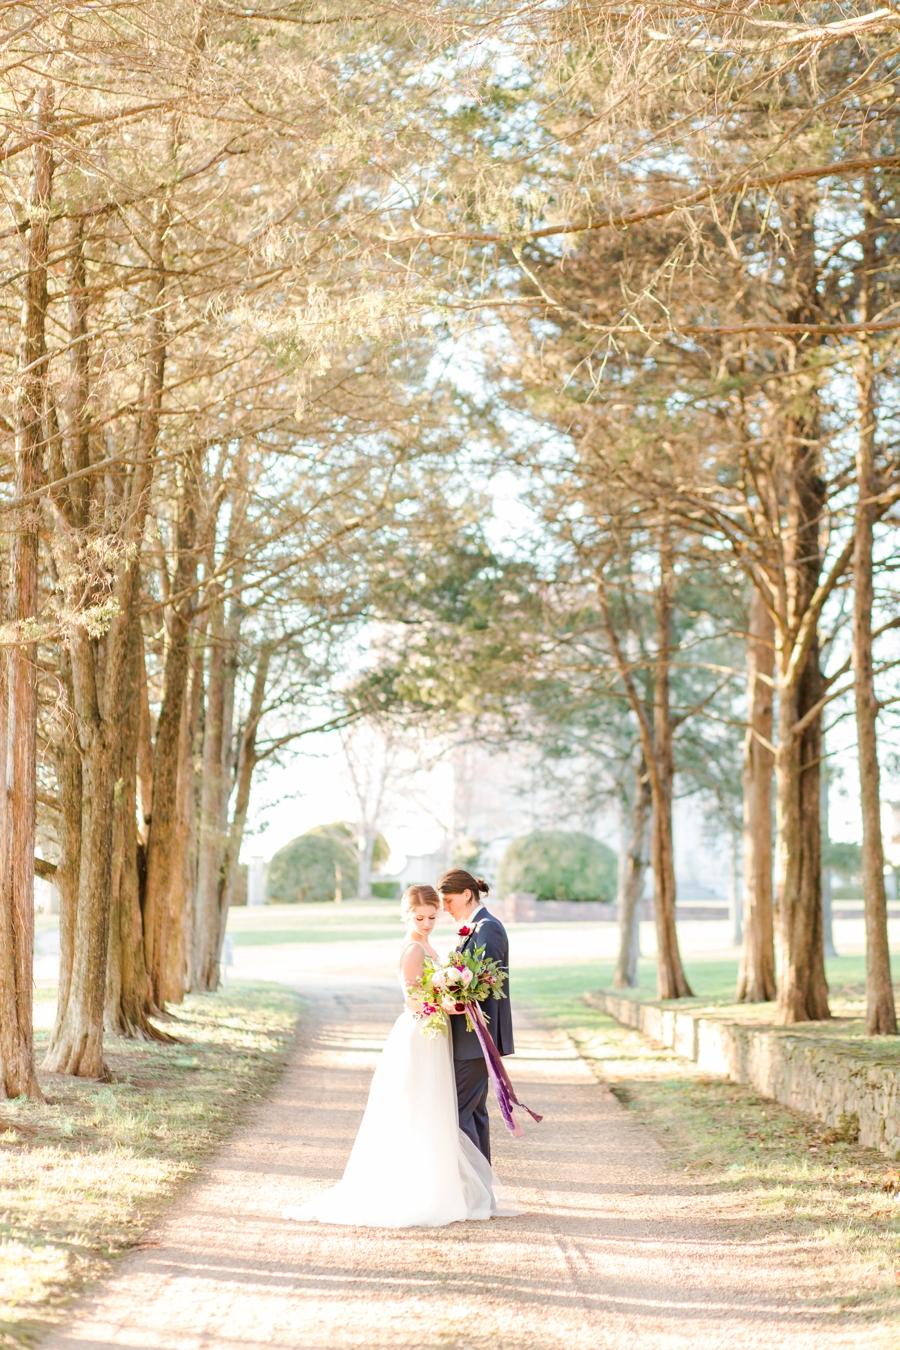 Elegant, Romantic Blush & Plum Wedding Ideas via TheELD.com